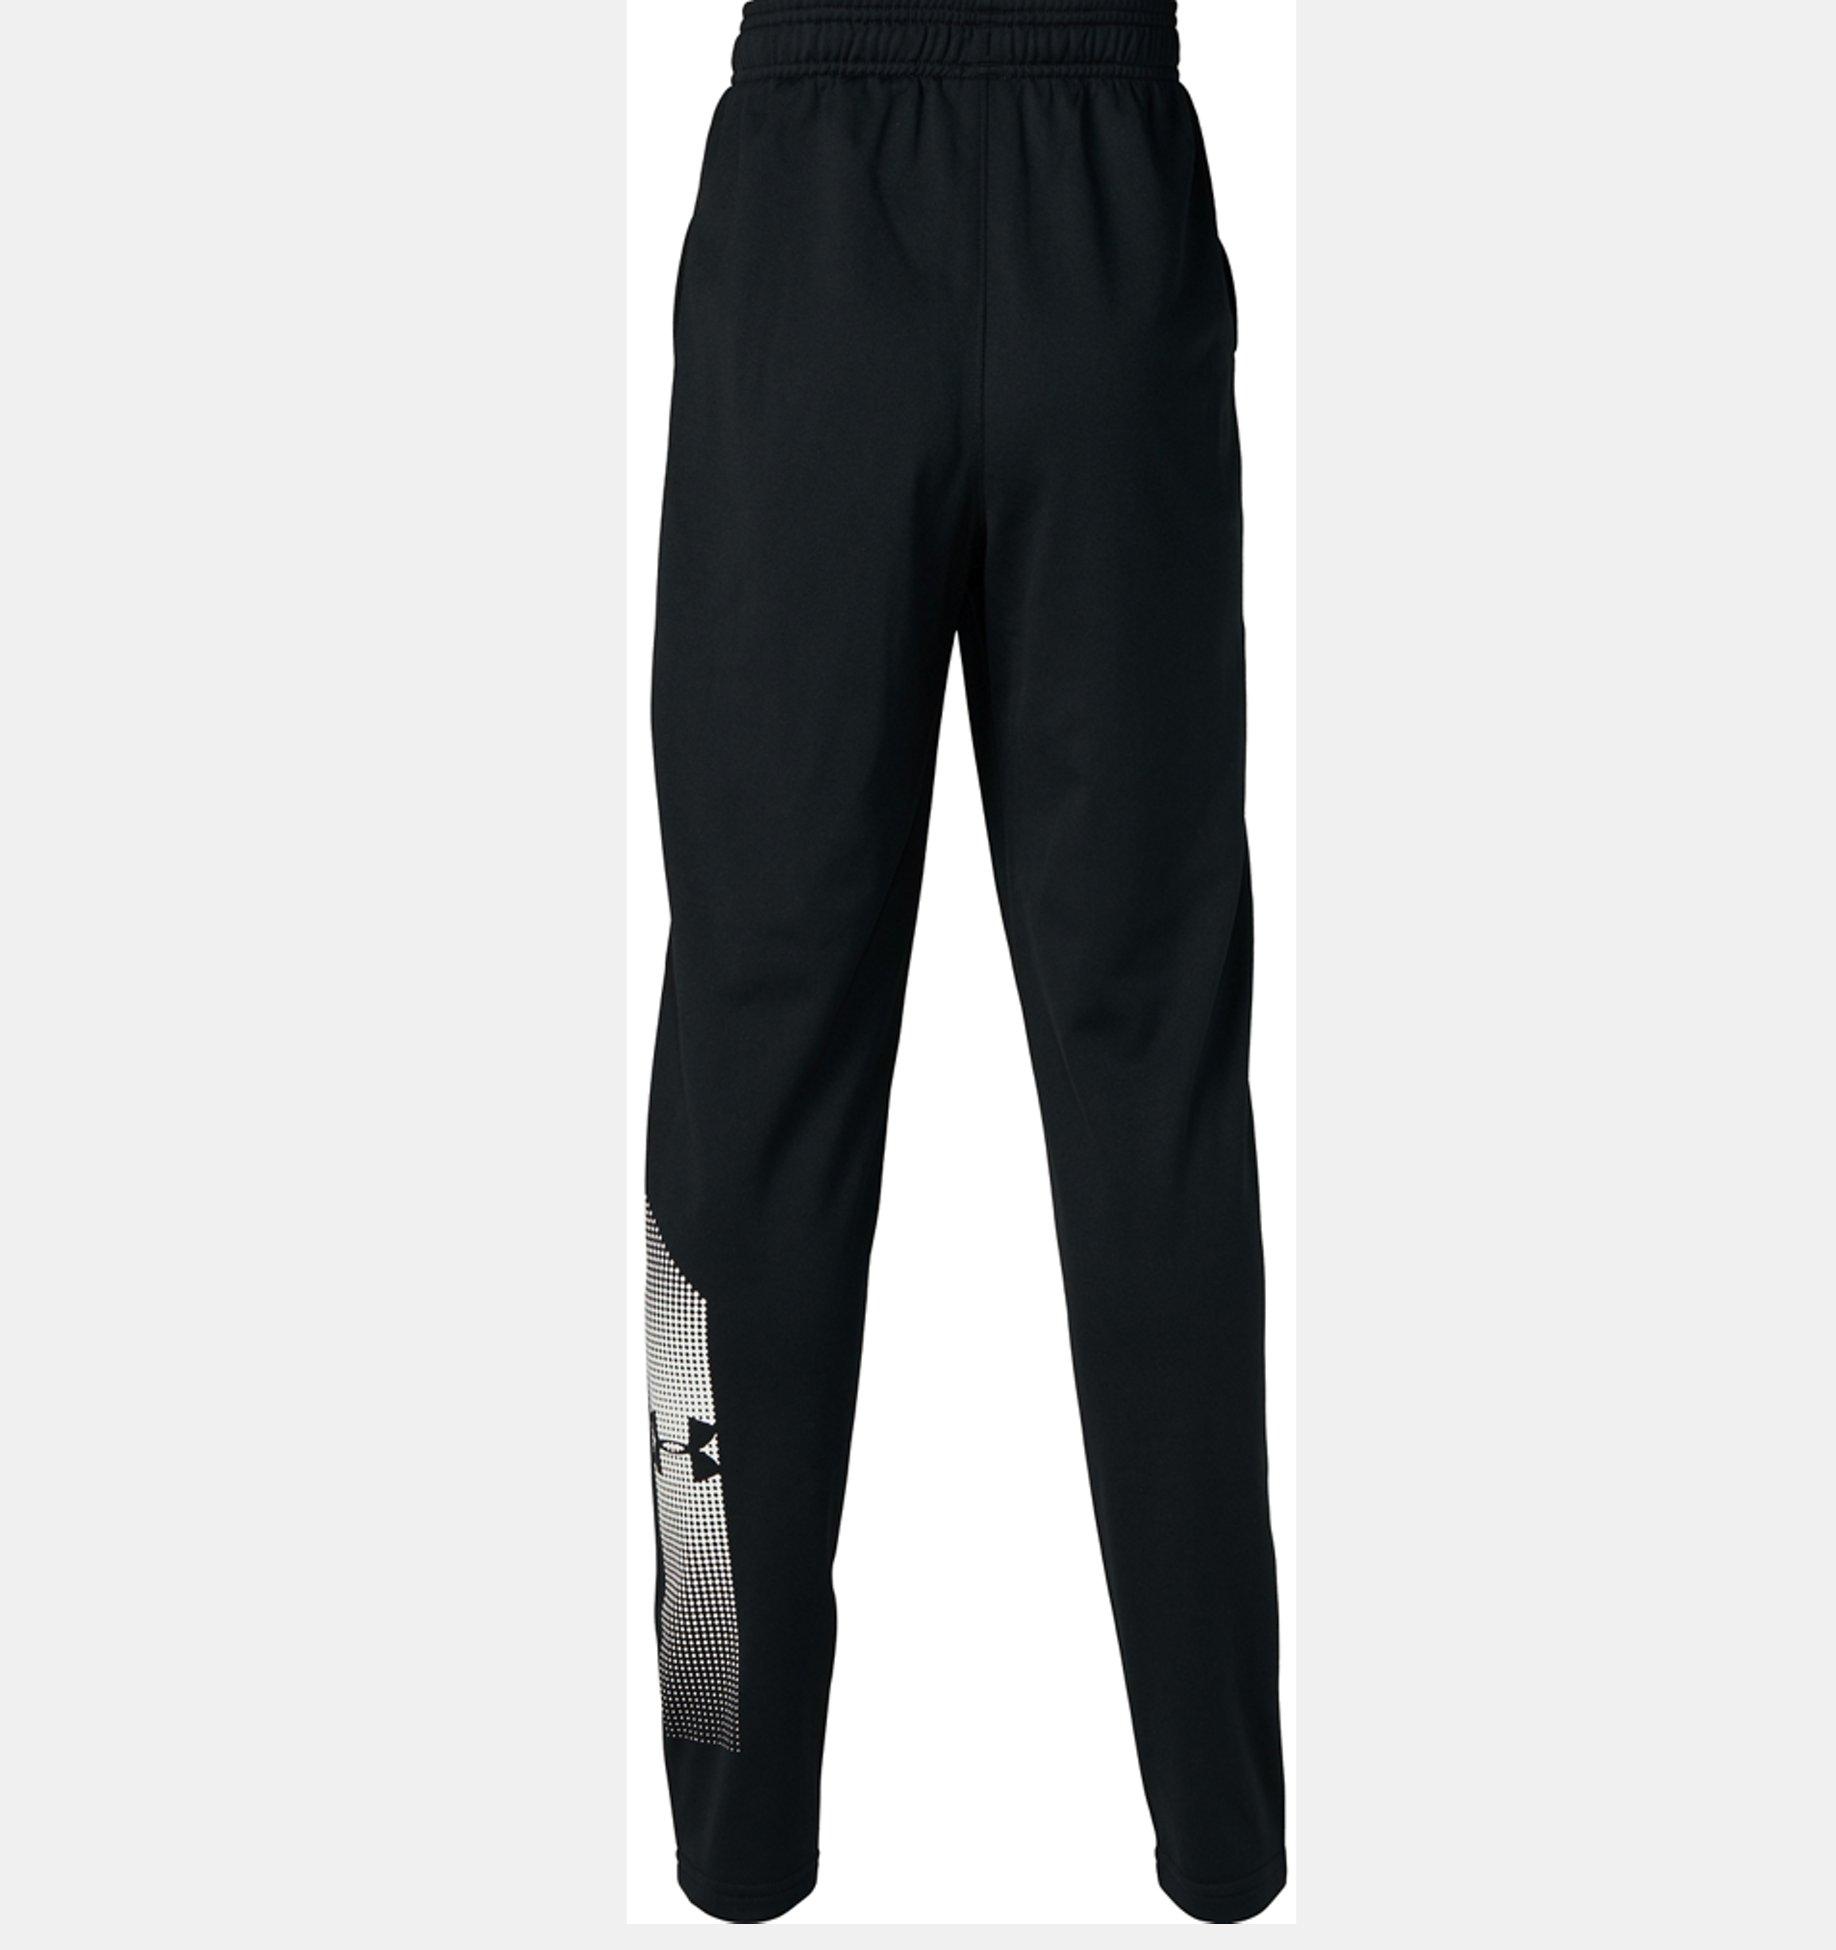 7d4b6704446f Boys  UA Brawler 2.0 Tapered Trousers ...